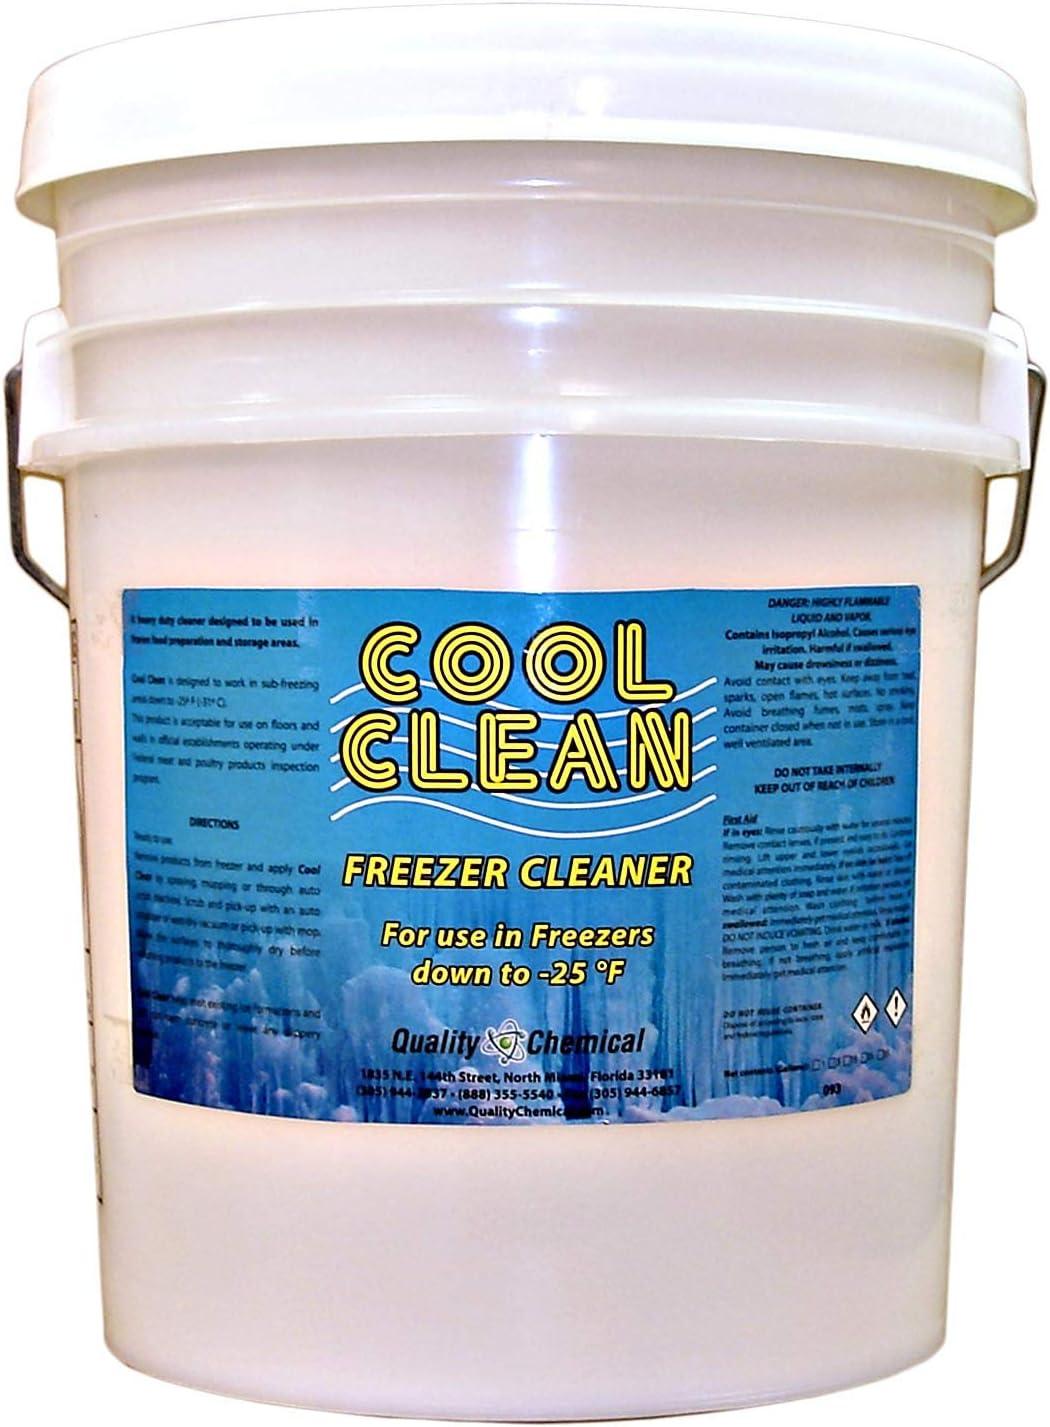 Cool Clean Heavy-Duty Freezer Cleaner-5 gallon pail